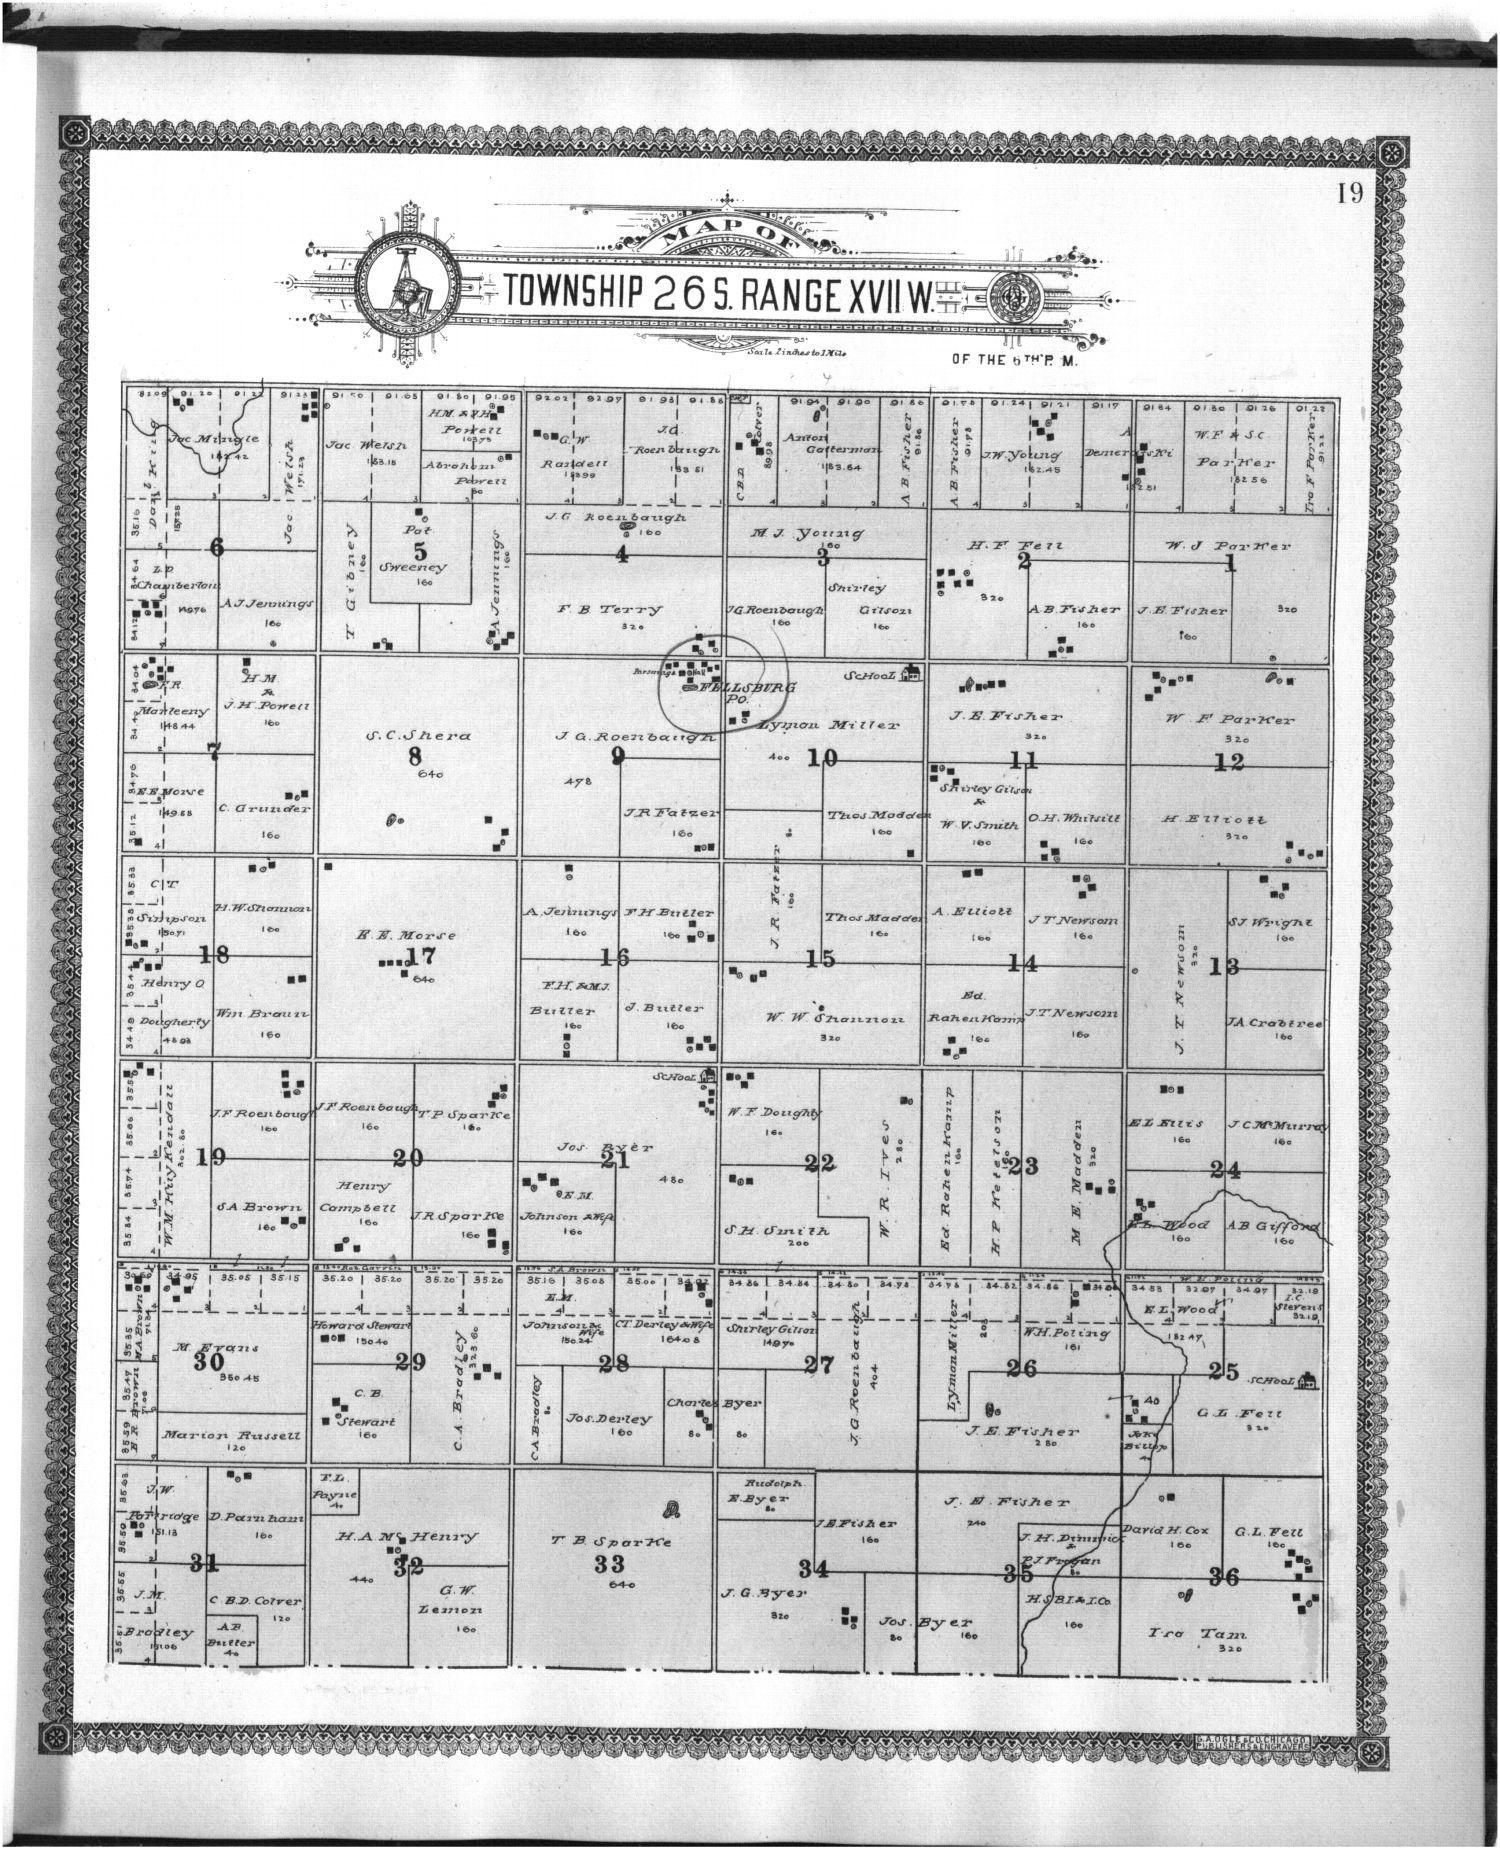 Standard atlas of Edwards County - 19